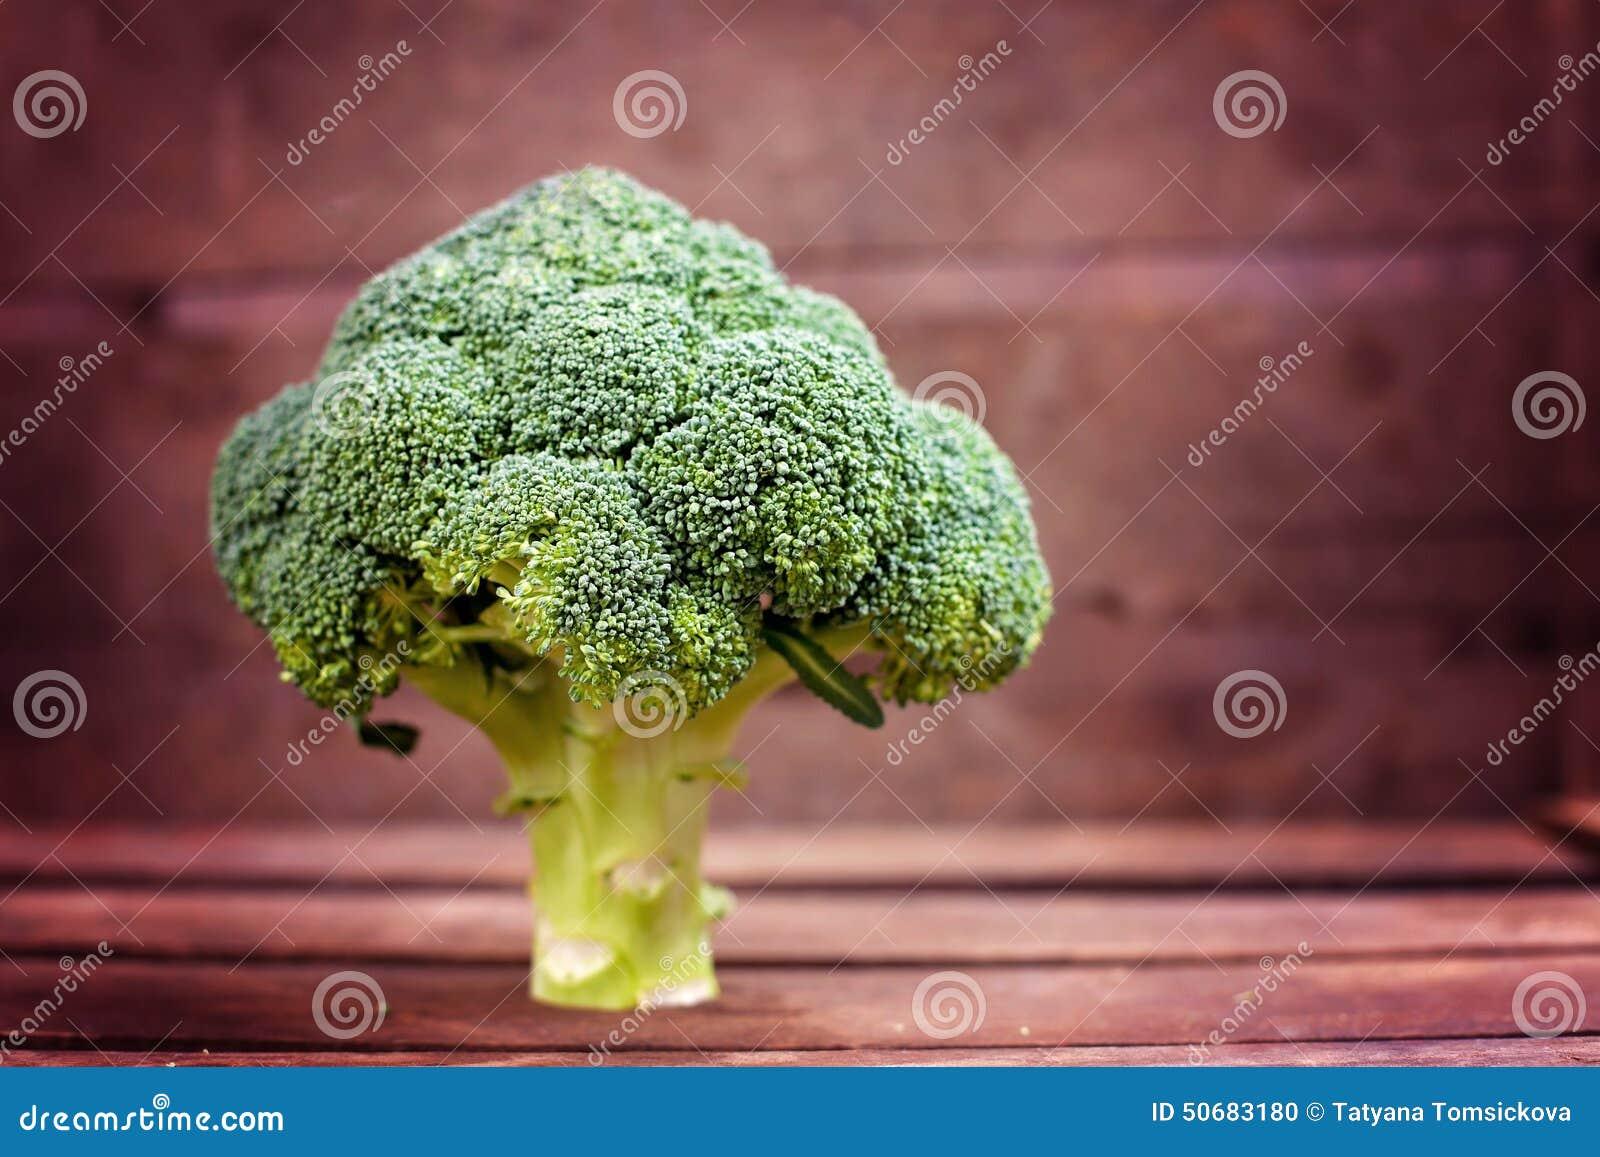 Download 在木桌上的新鲜的硬花甘蓝 库存照片. 图片 包括有 会议室, 节食, 食物, 圆白菜, 美食, 营养, 成份 - 50683180